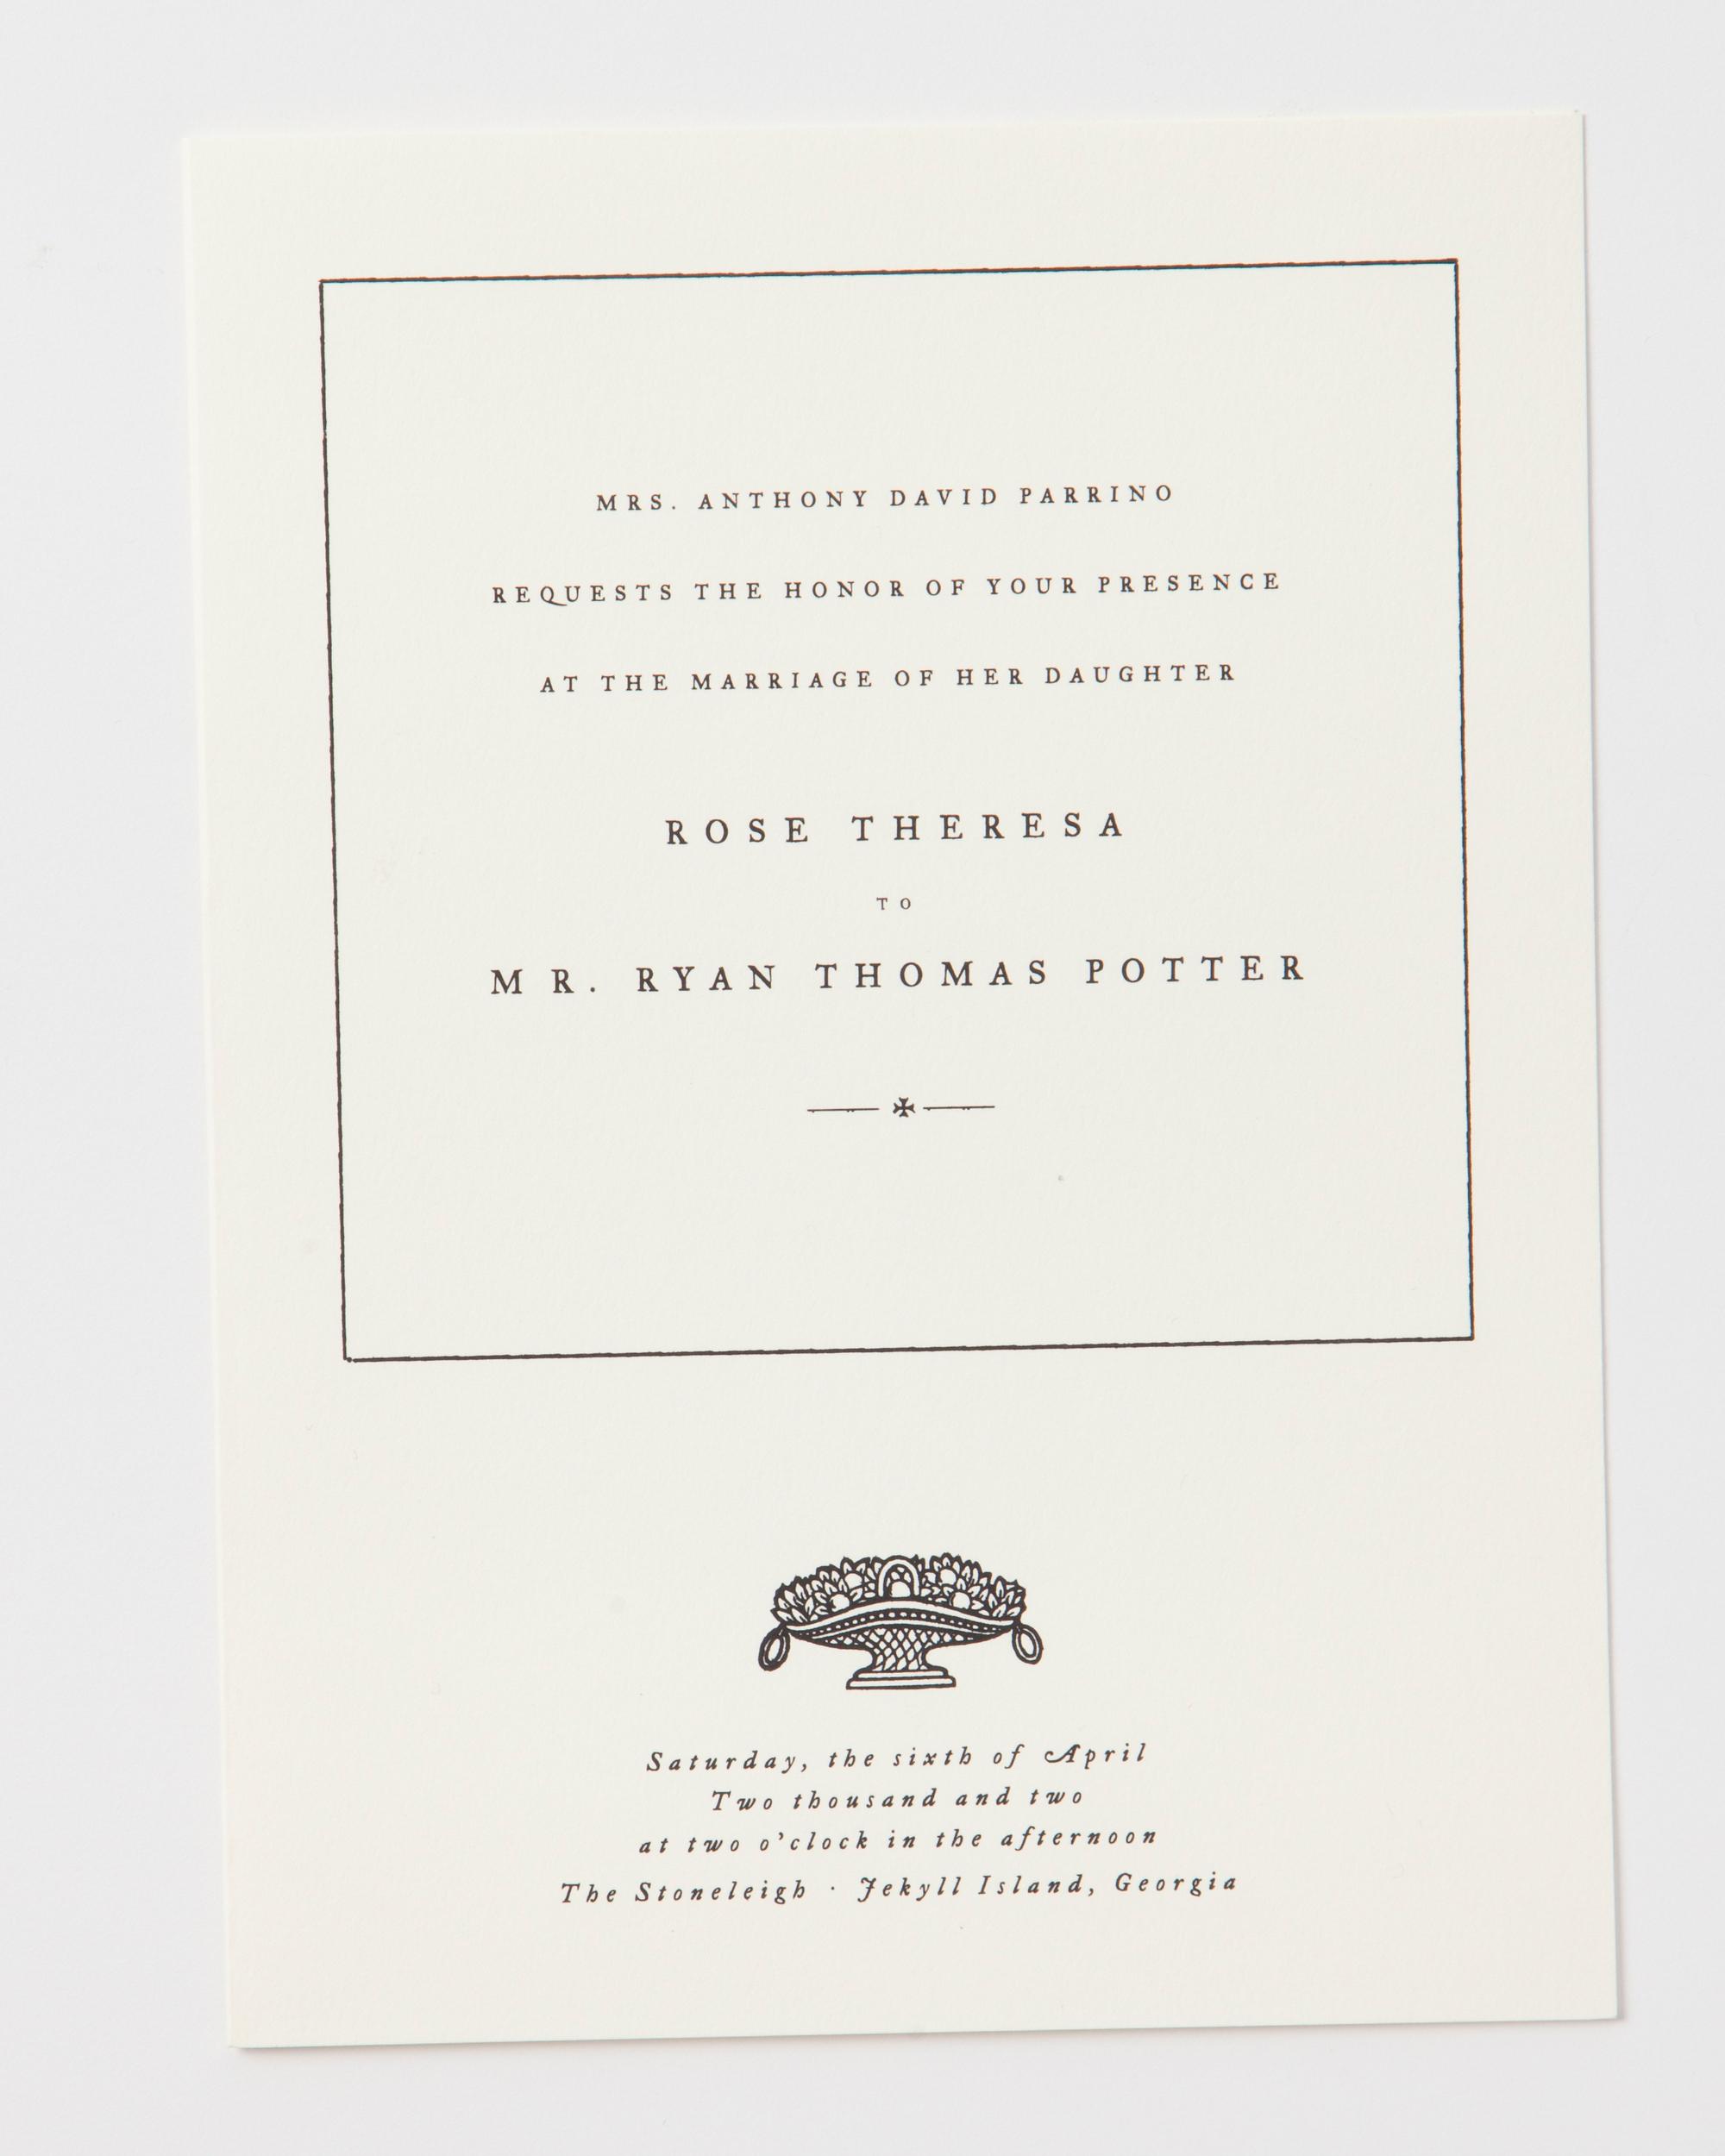 host-lines-weddings-stationery-3-remarried-widowed-parent-0526-d111607-1014.jpg